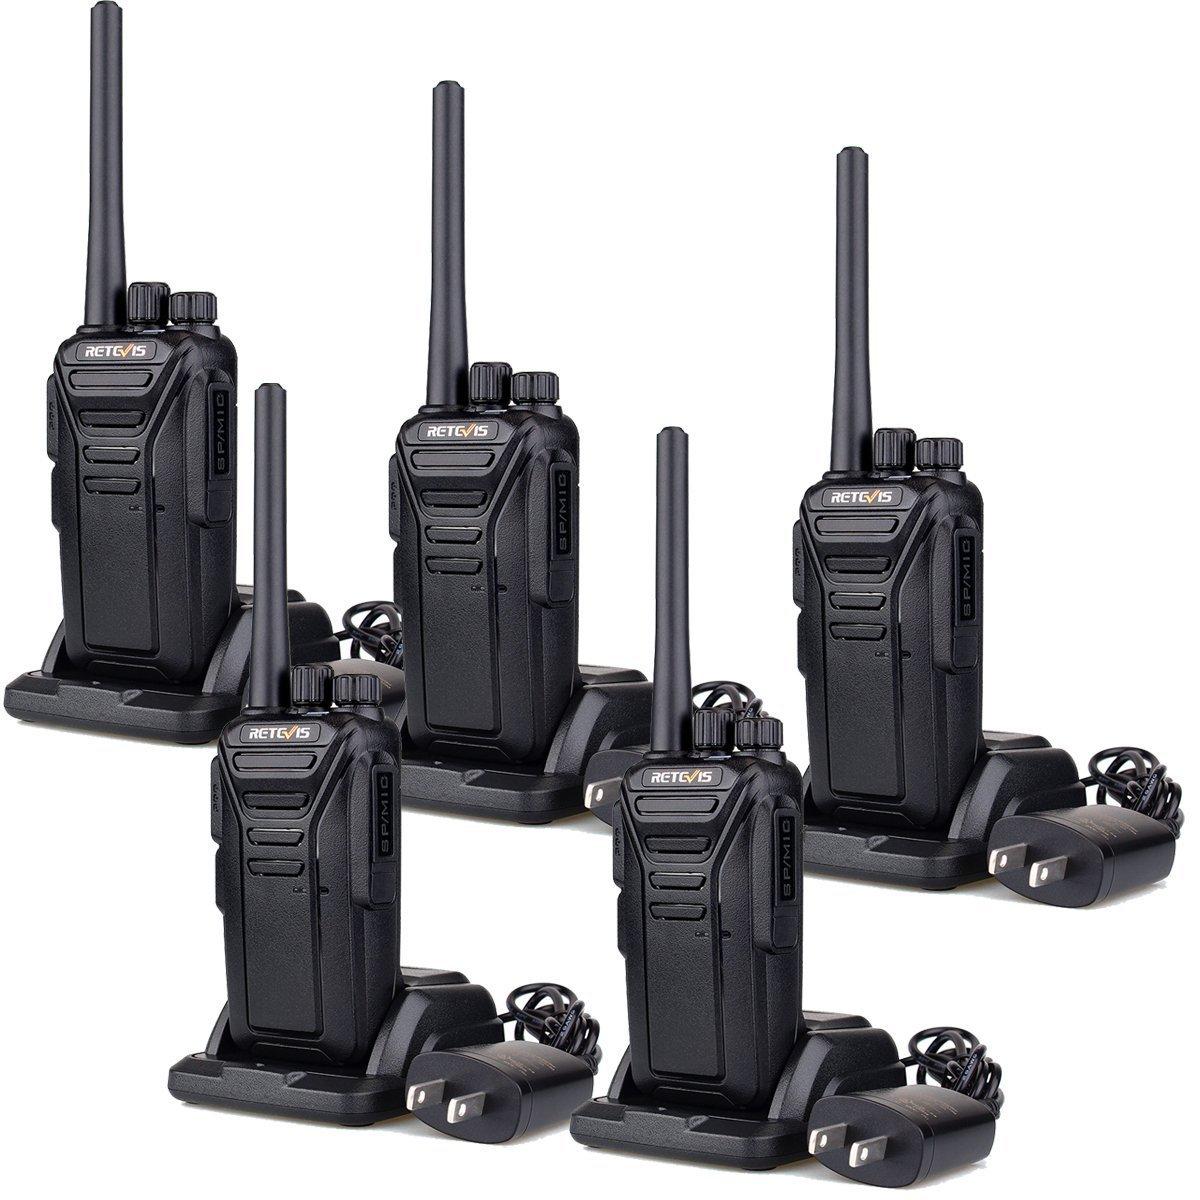 Retevis RT27 Walkie Talkies FRS Radio 22CH Scrambler VOX FCC Certification License-free 2 Way Radio (Black,5 pack)